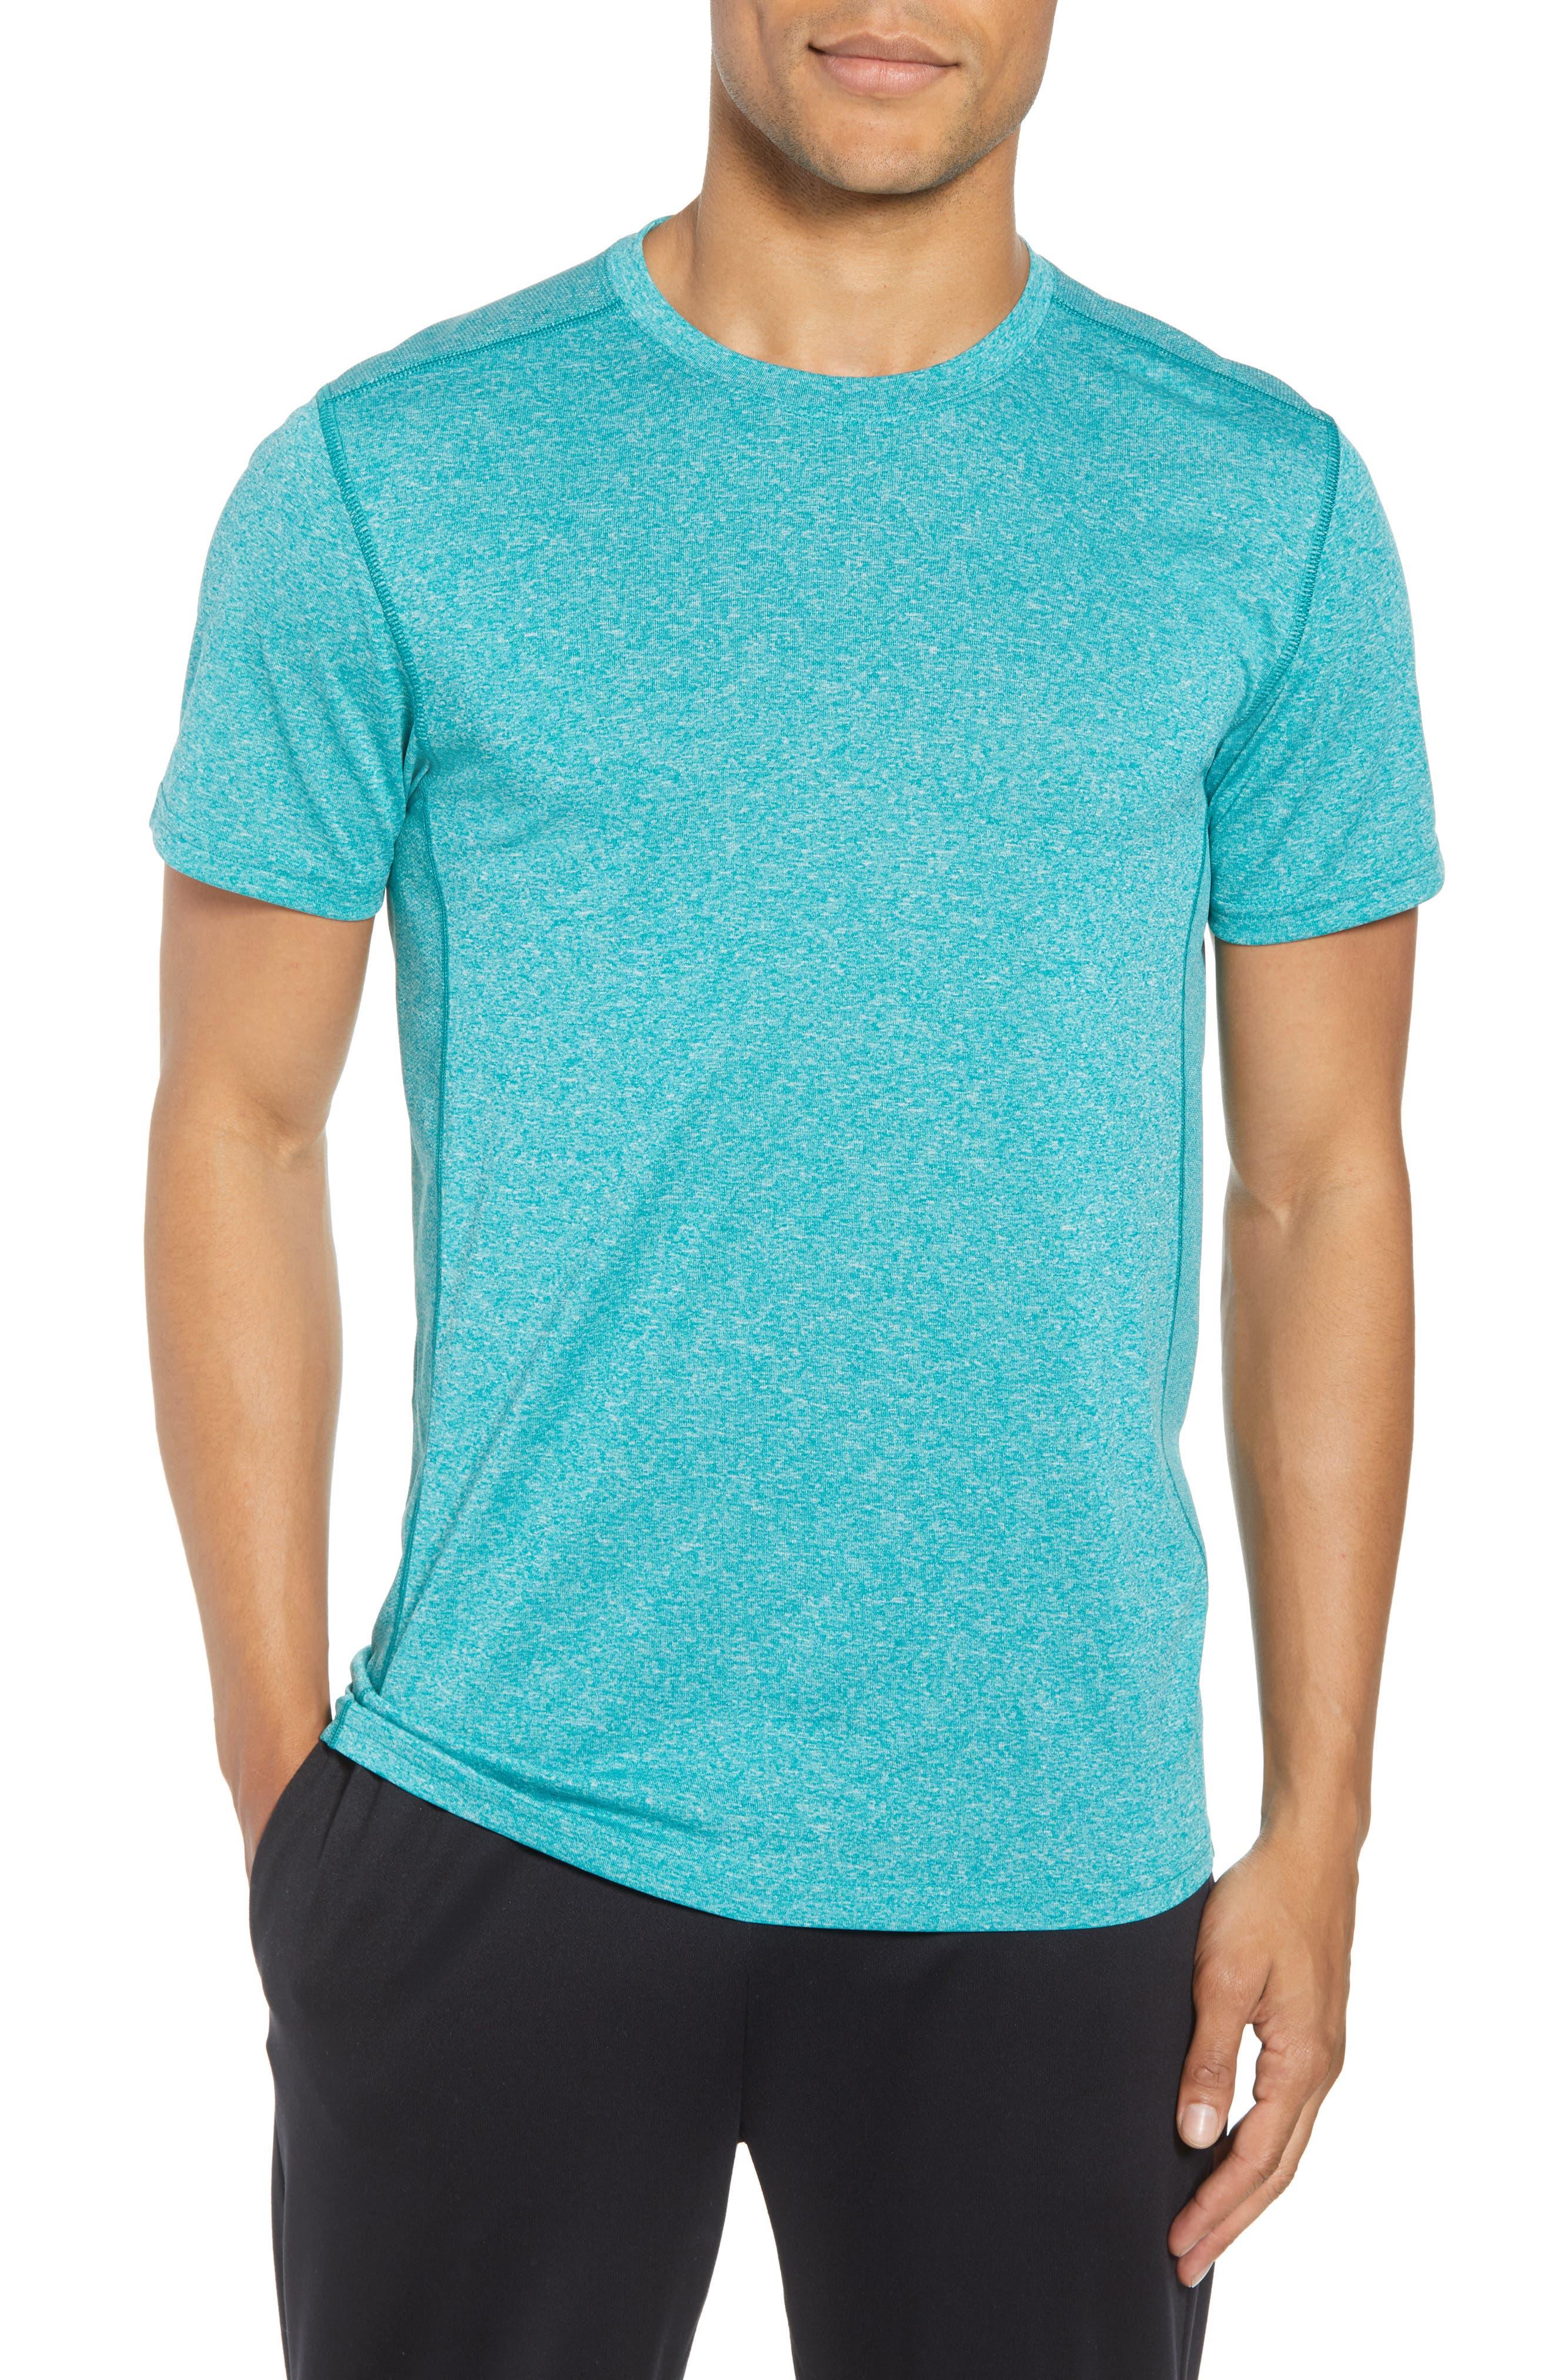 Goodsport Mesh Panel T-Shirt,                             Main thumbnail 4, color,